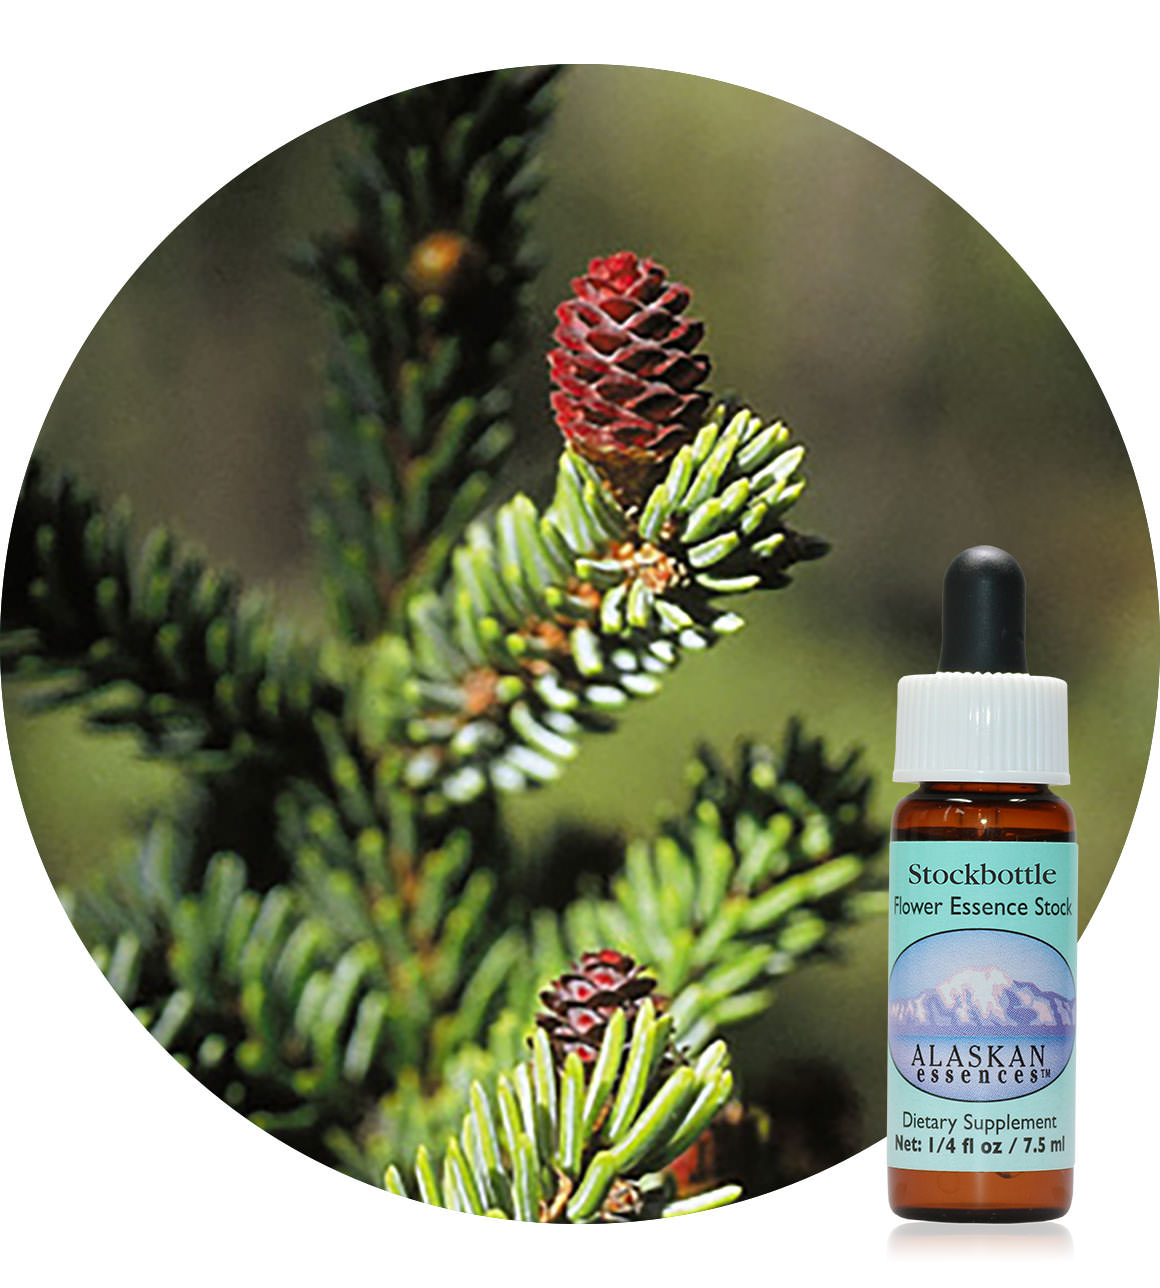 Black Spruce 7,5 ml